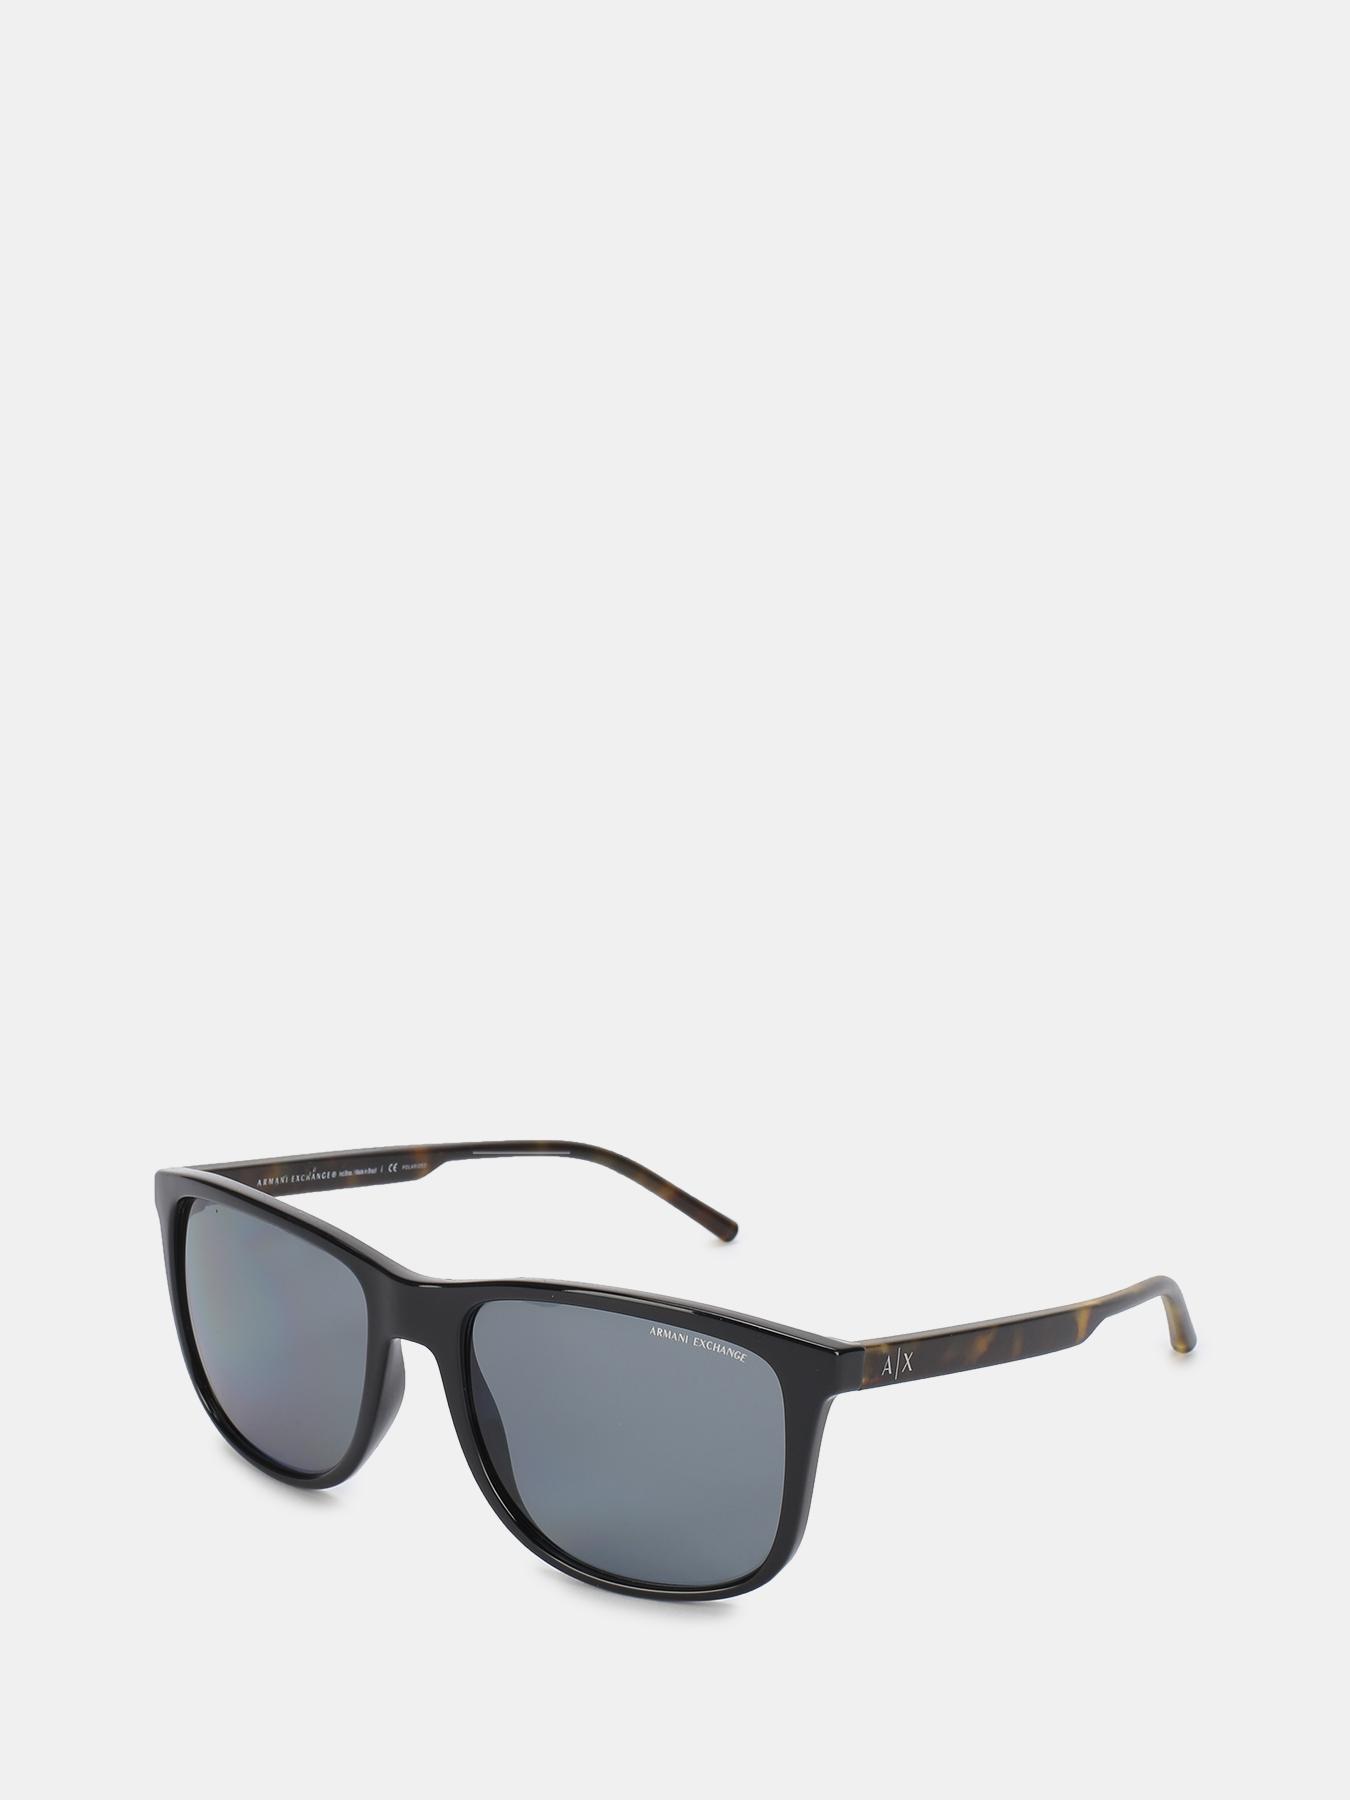 Очки Armani Exchange Солнцезащитные очки очки солнцезащитные oodji oodji oo001dwlxd27